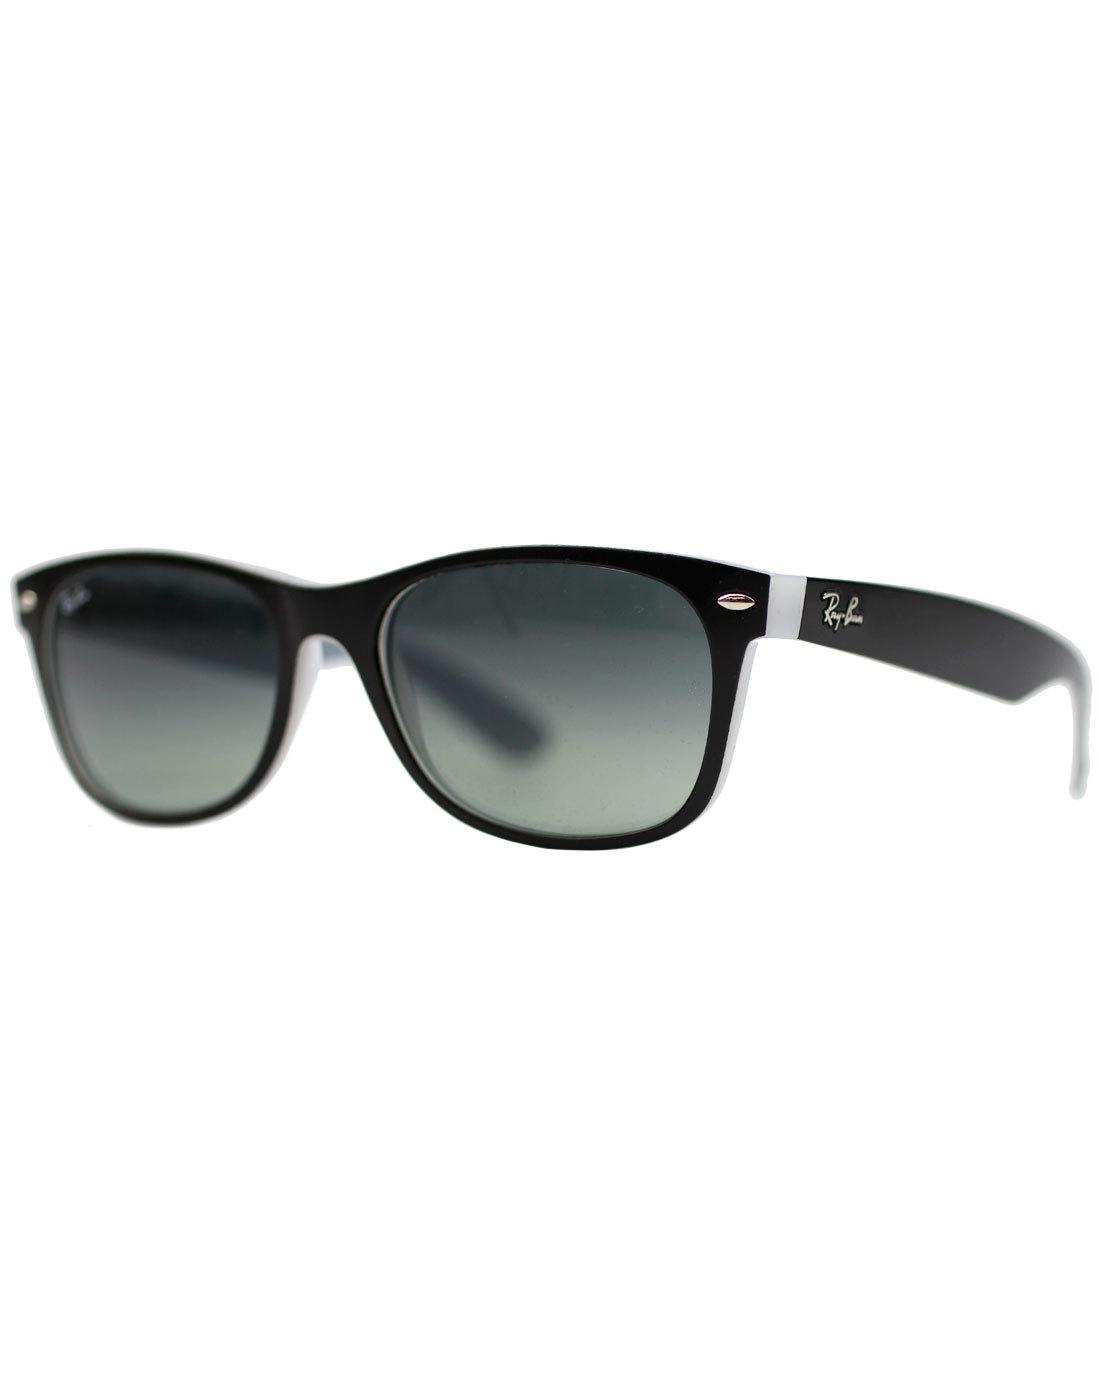 New Wayfarer RAY-BAN Retro Sunglasses - Black/Ice